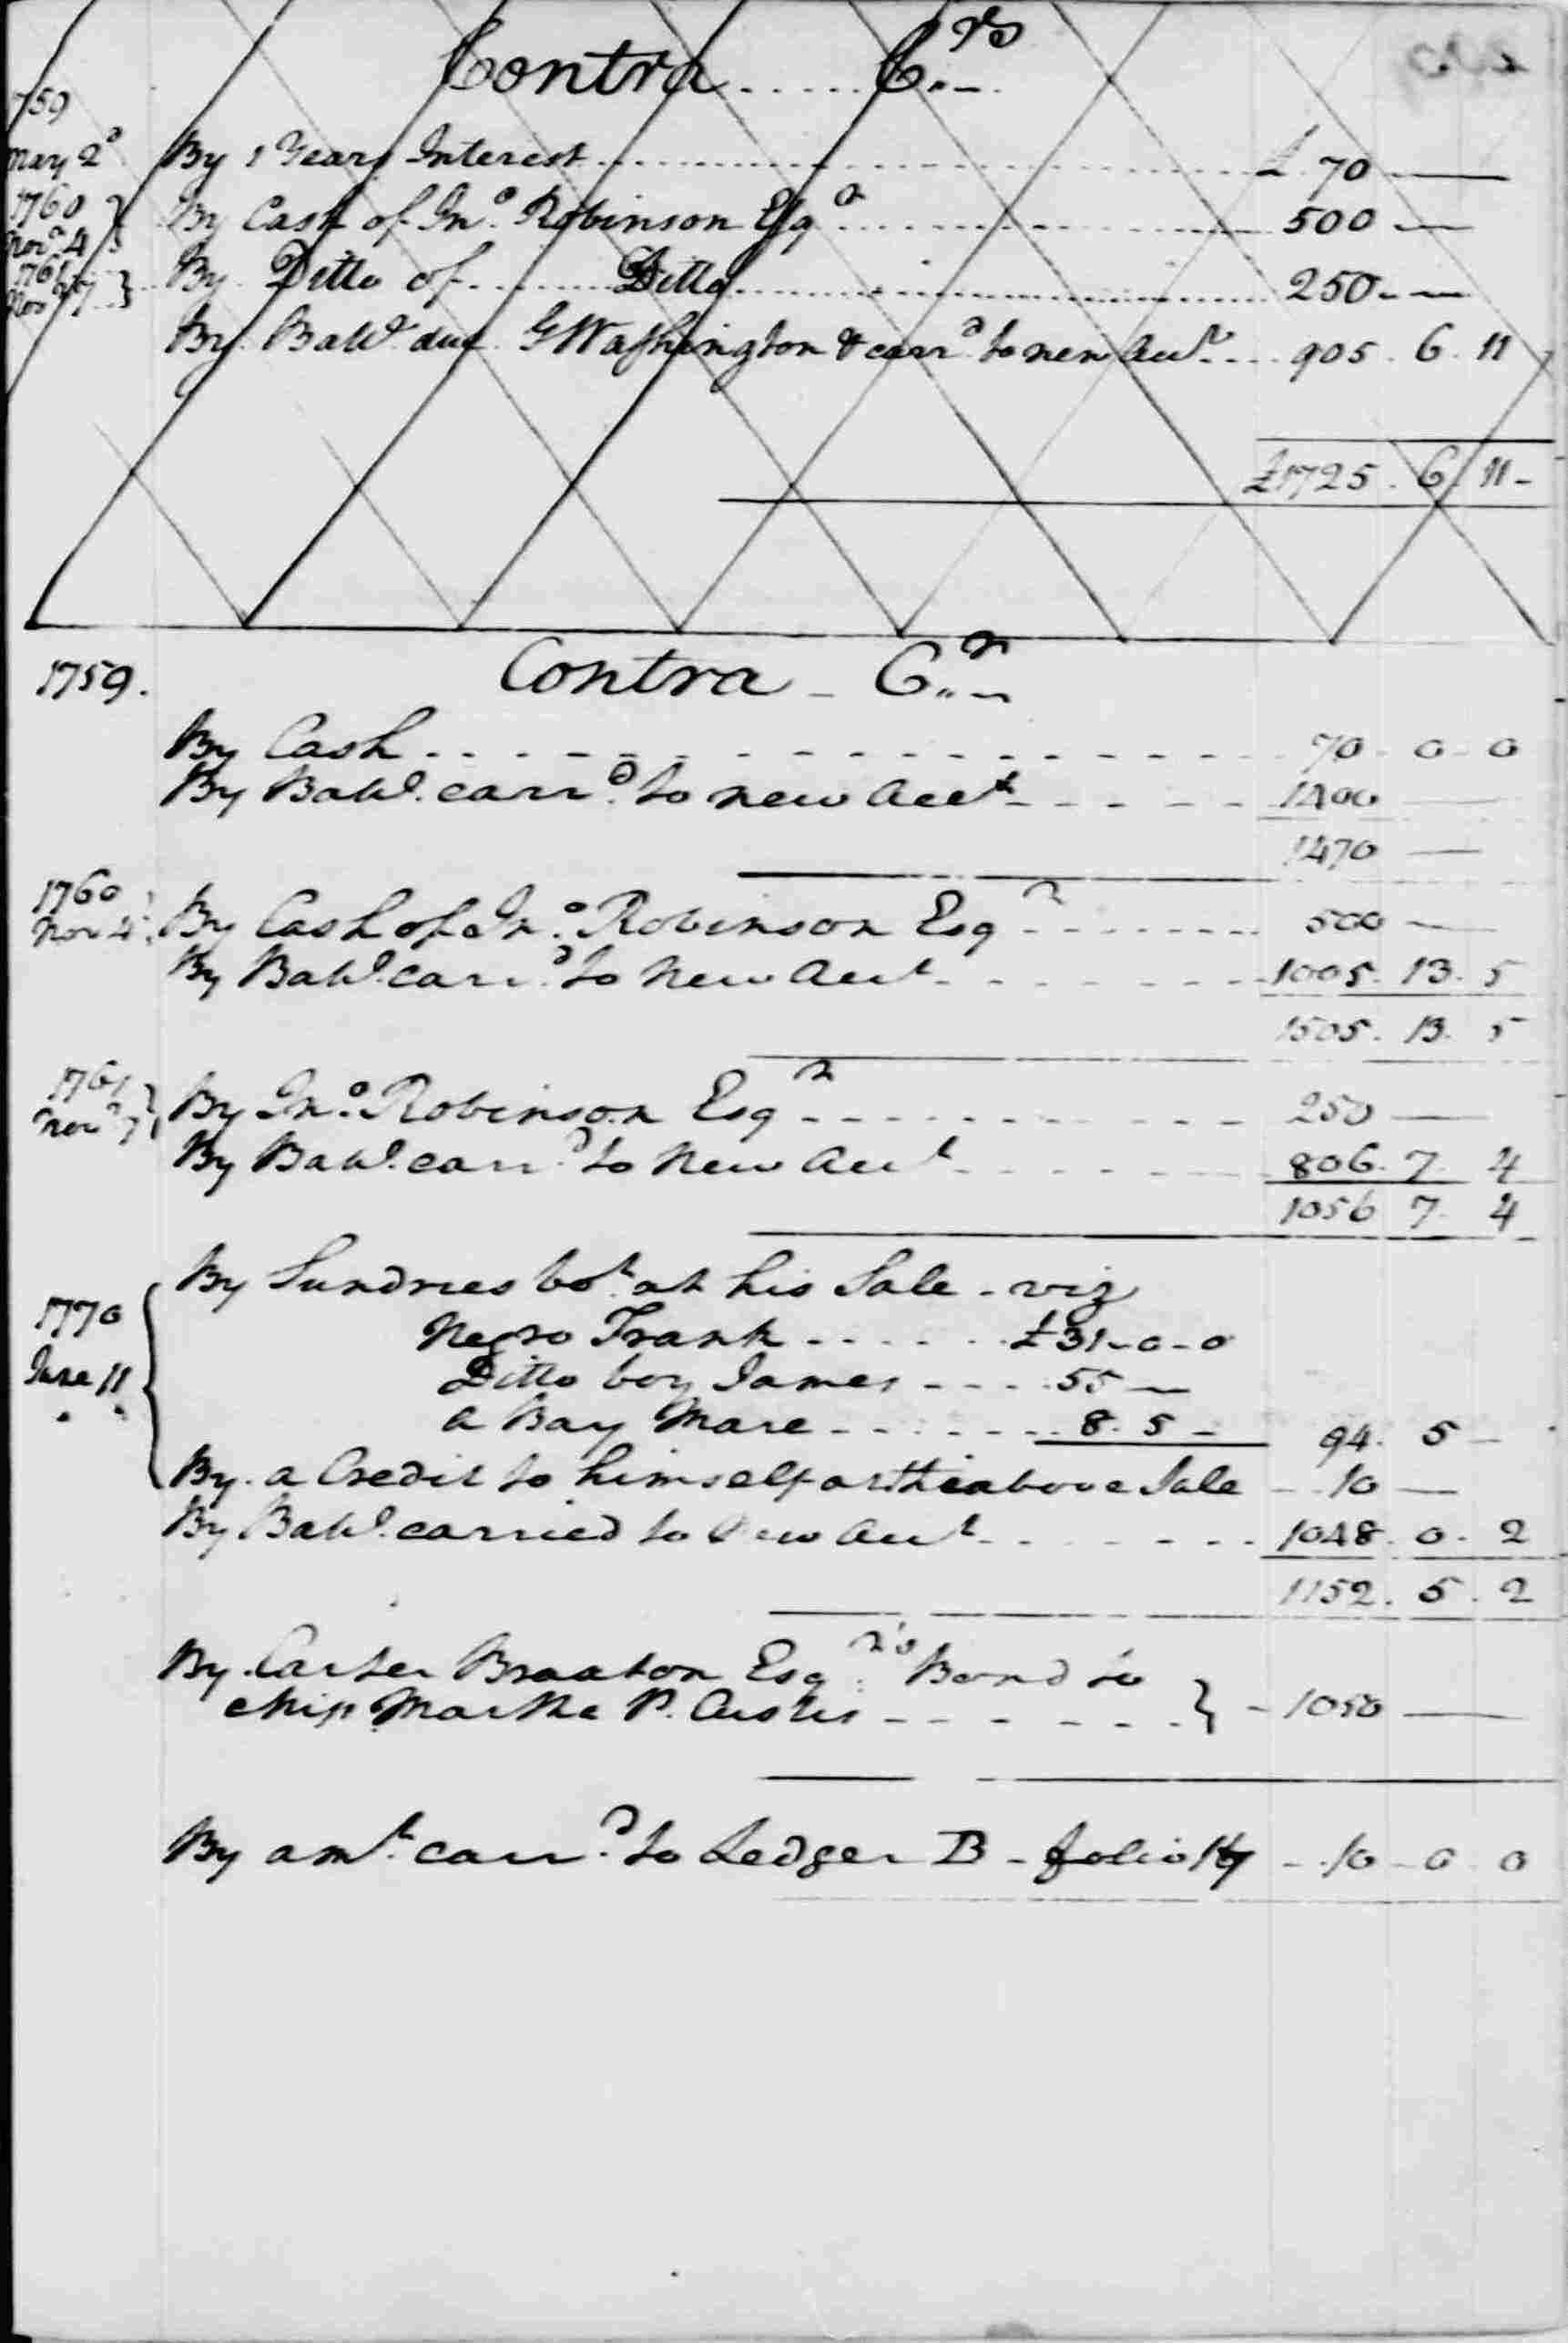 Ledger A, folio 204, right side